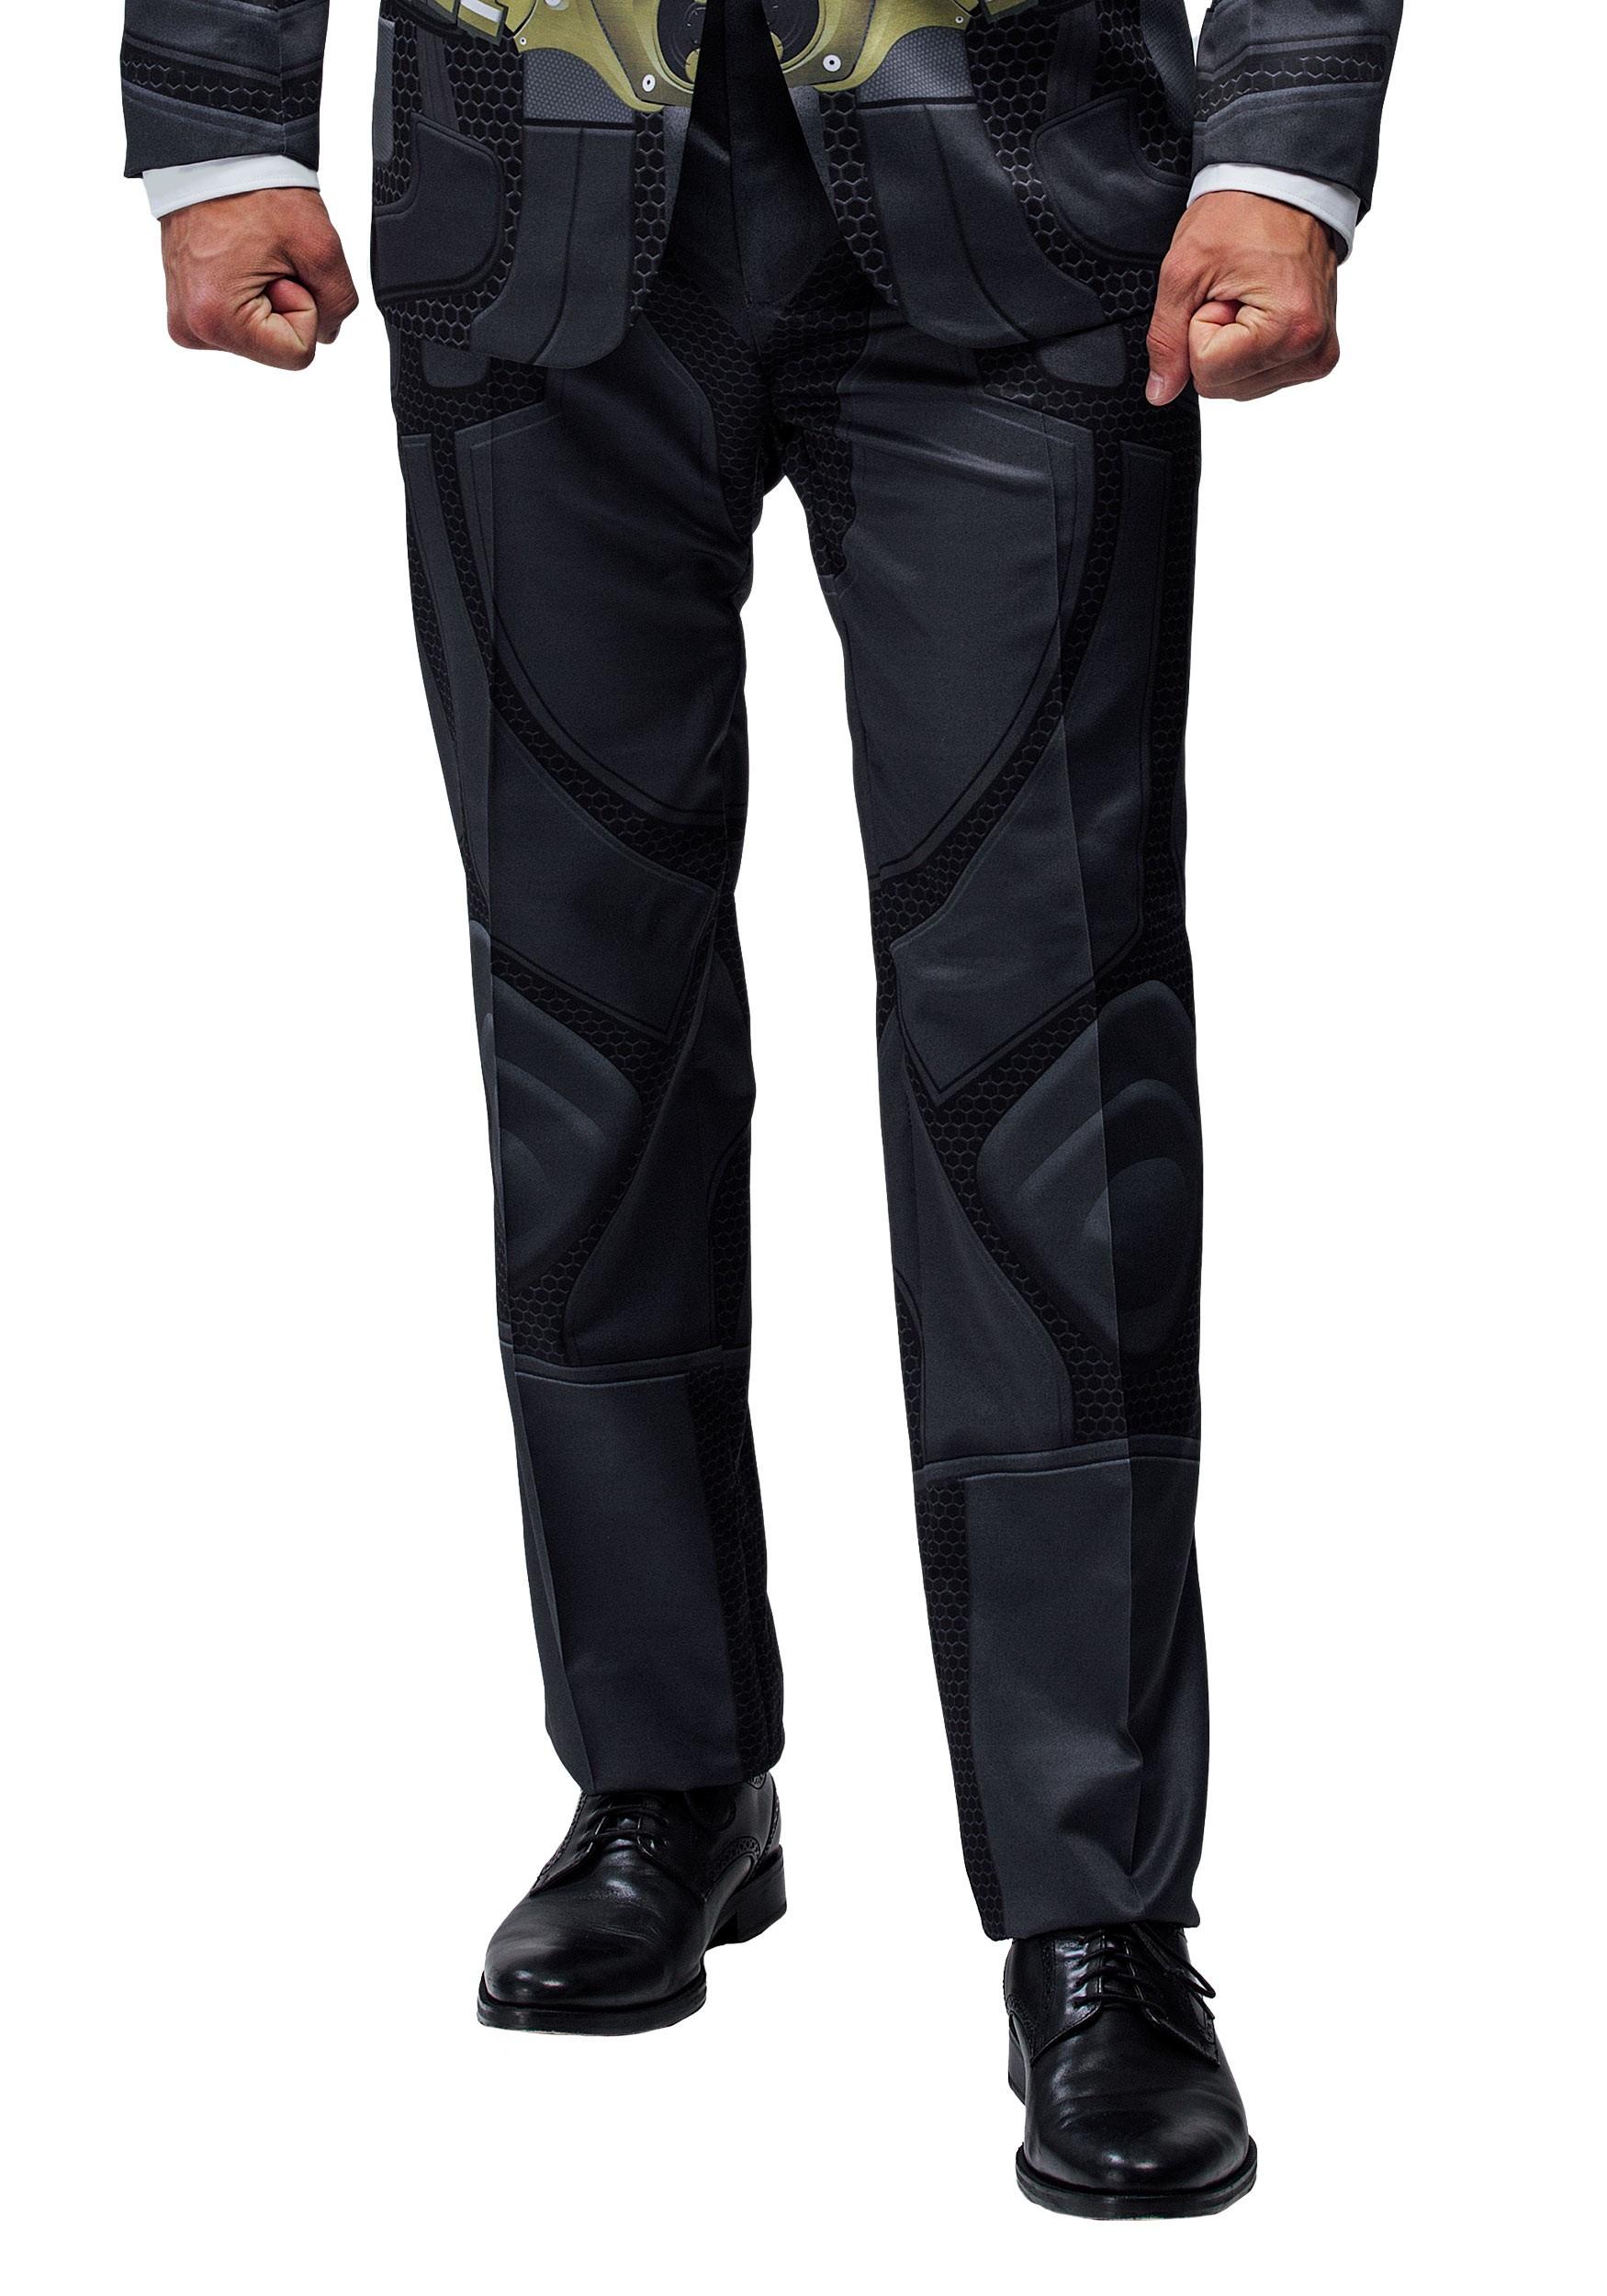 Alter Ego Dark Knight Slim Fit Suit Pants for Men